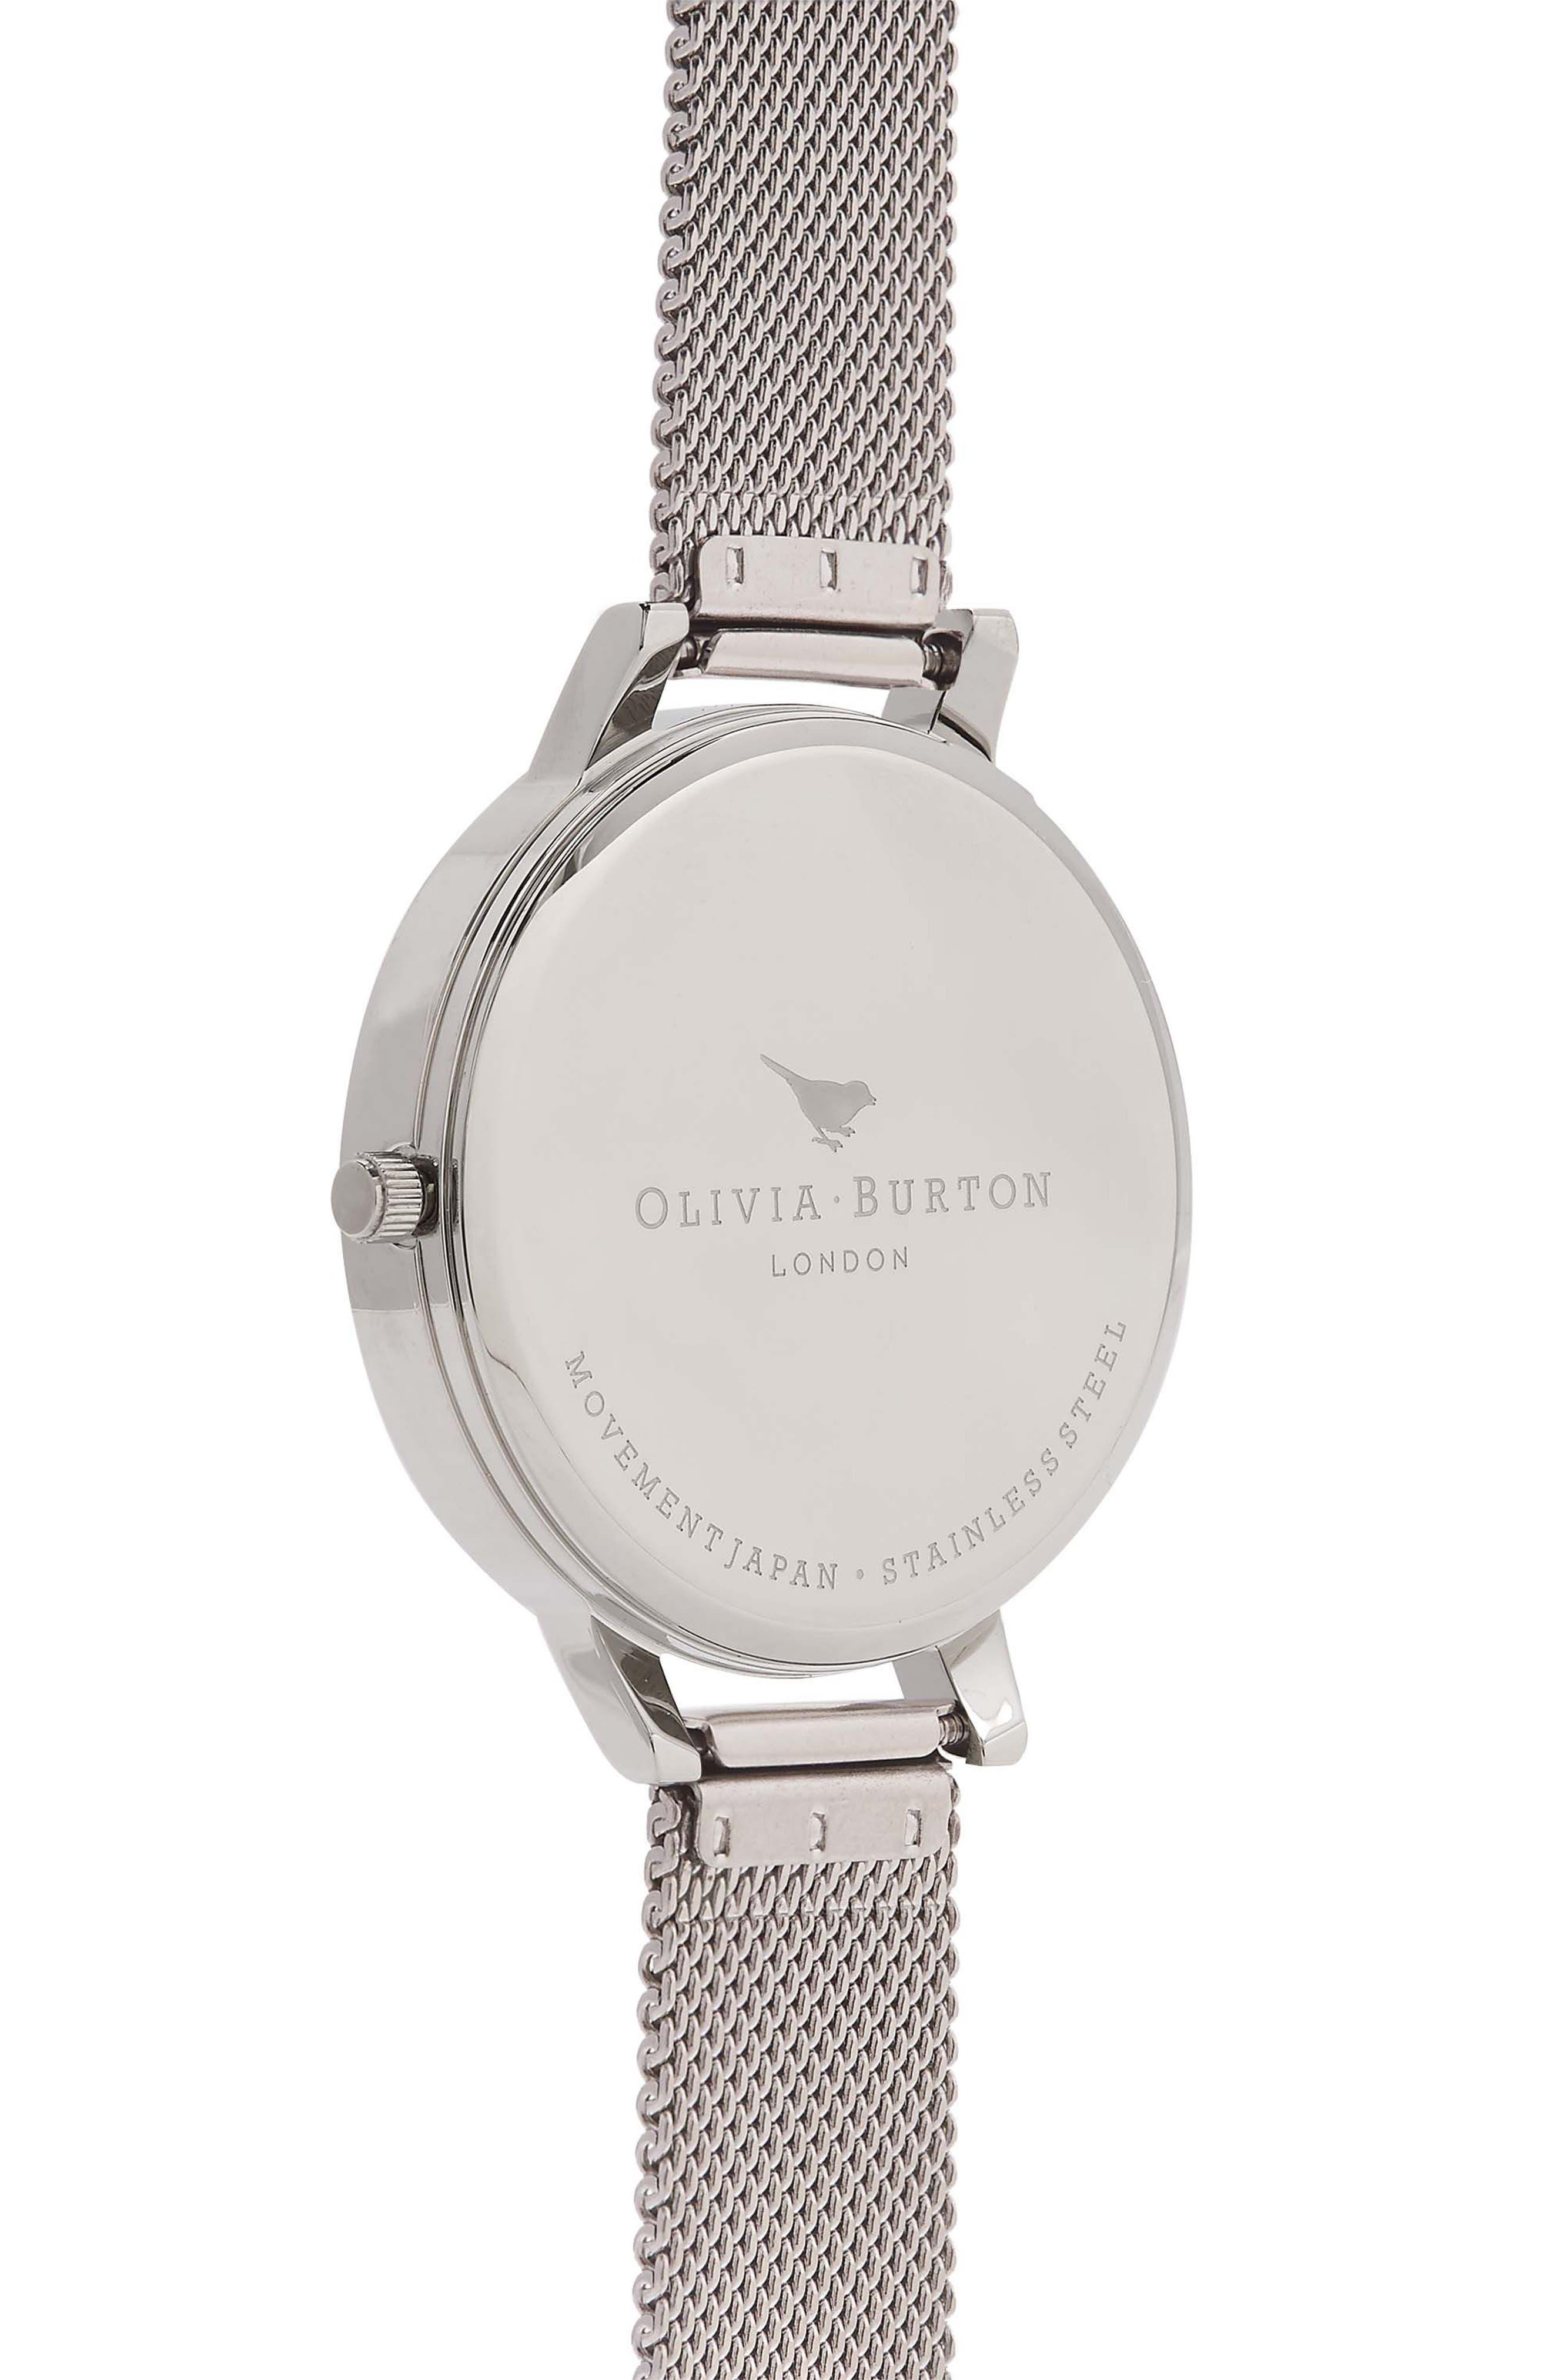 OLIVIA BURTON, Mesh Strap Watch, 38mm, Alternate thumbnail 3, color, SILVER/ WHITE/ ROSE GOLD